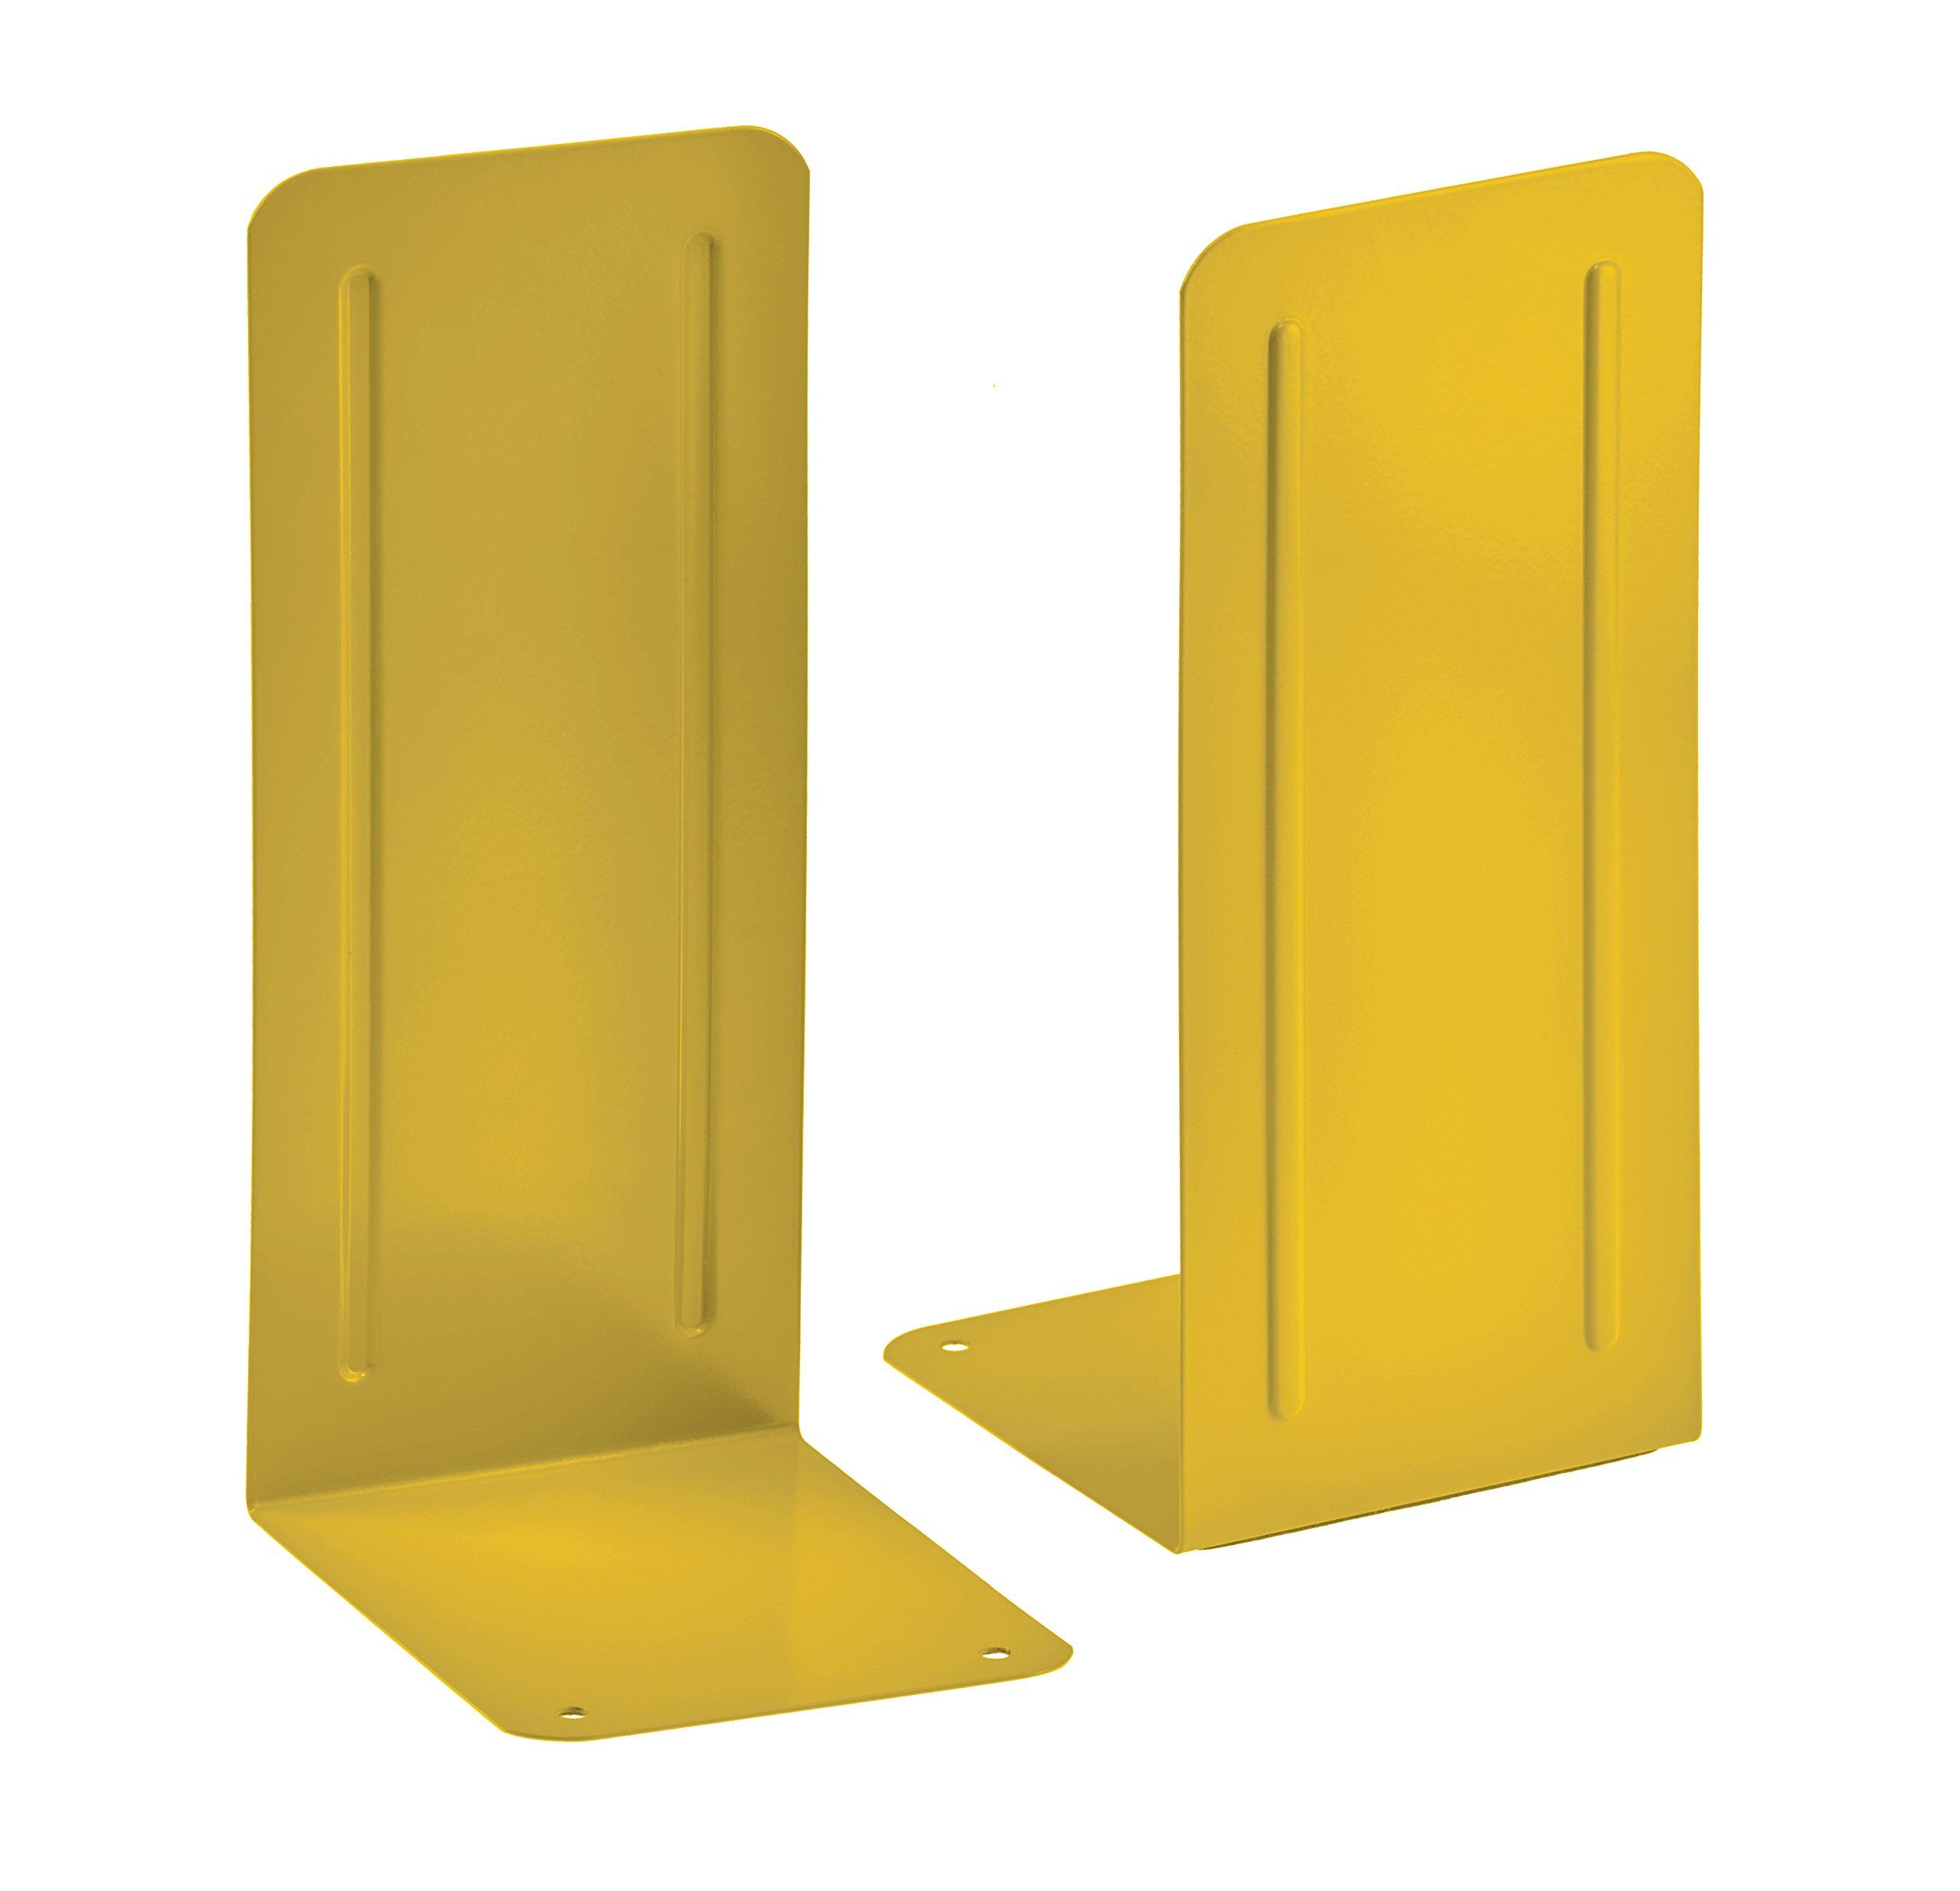 Acrimet Jumbo Premium Bookends 9'' (Yellow Color) (1 Pair)